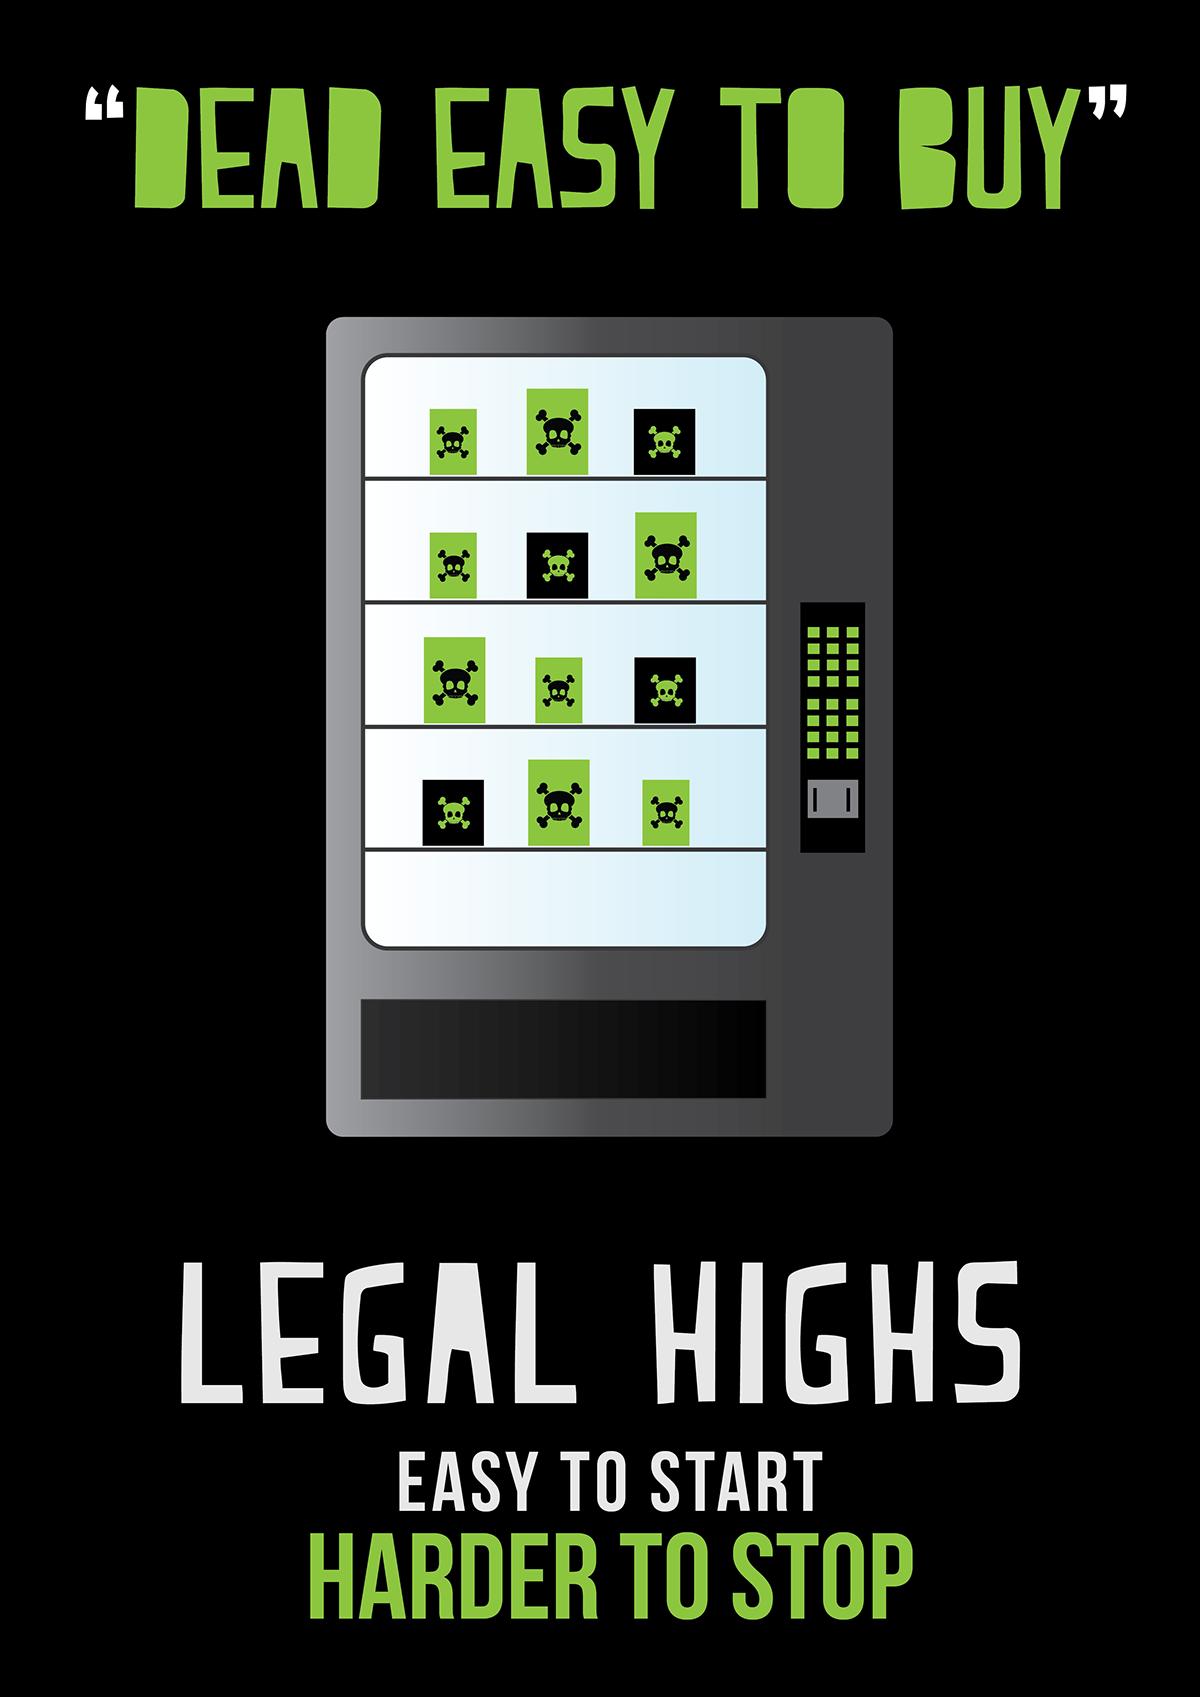 Dangers of Legal Highs Awareness on Behance